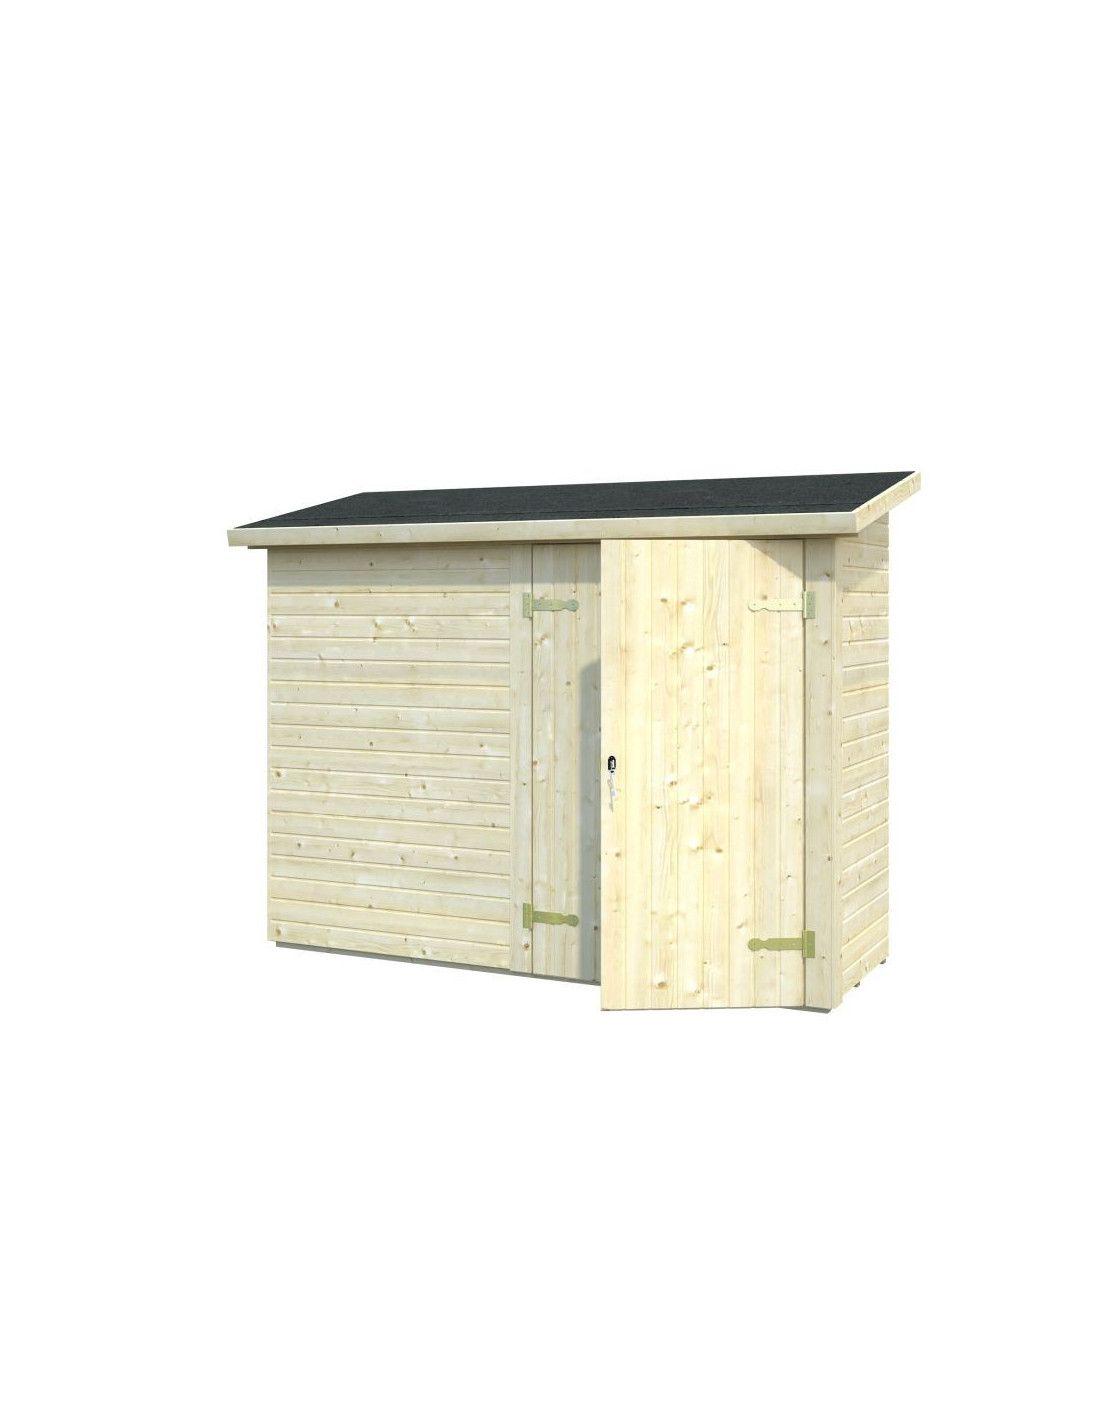 Armarios de exterior en madera mod leif 2 2 m hortum - Casetas de madera jardin ...